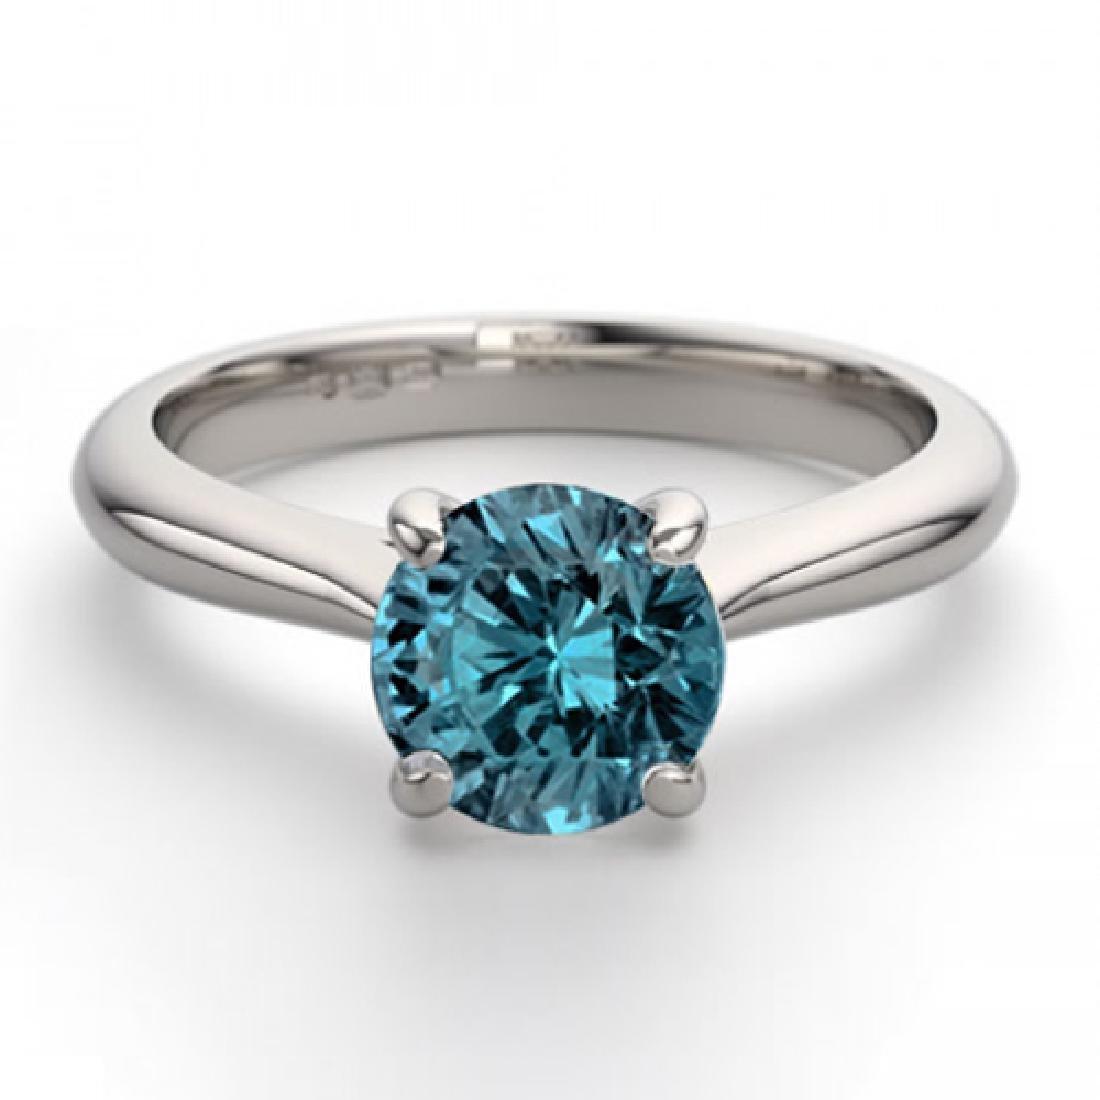 14K White Gold 1.52 ctw Blue Diamond Solitaire Ring -